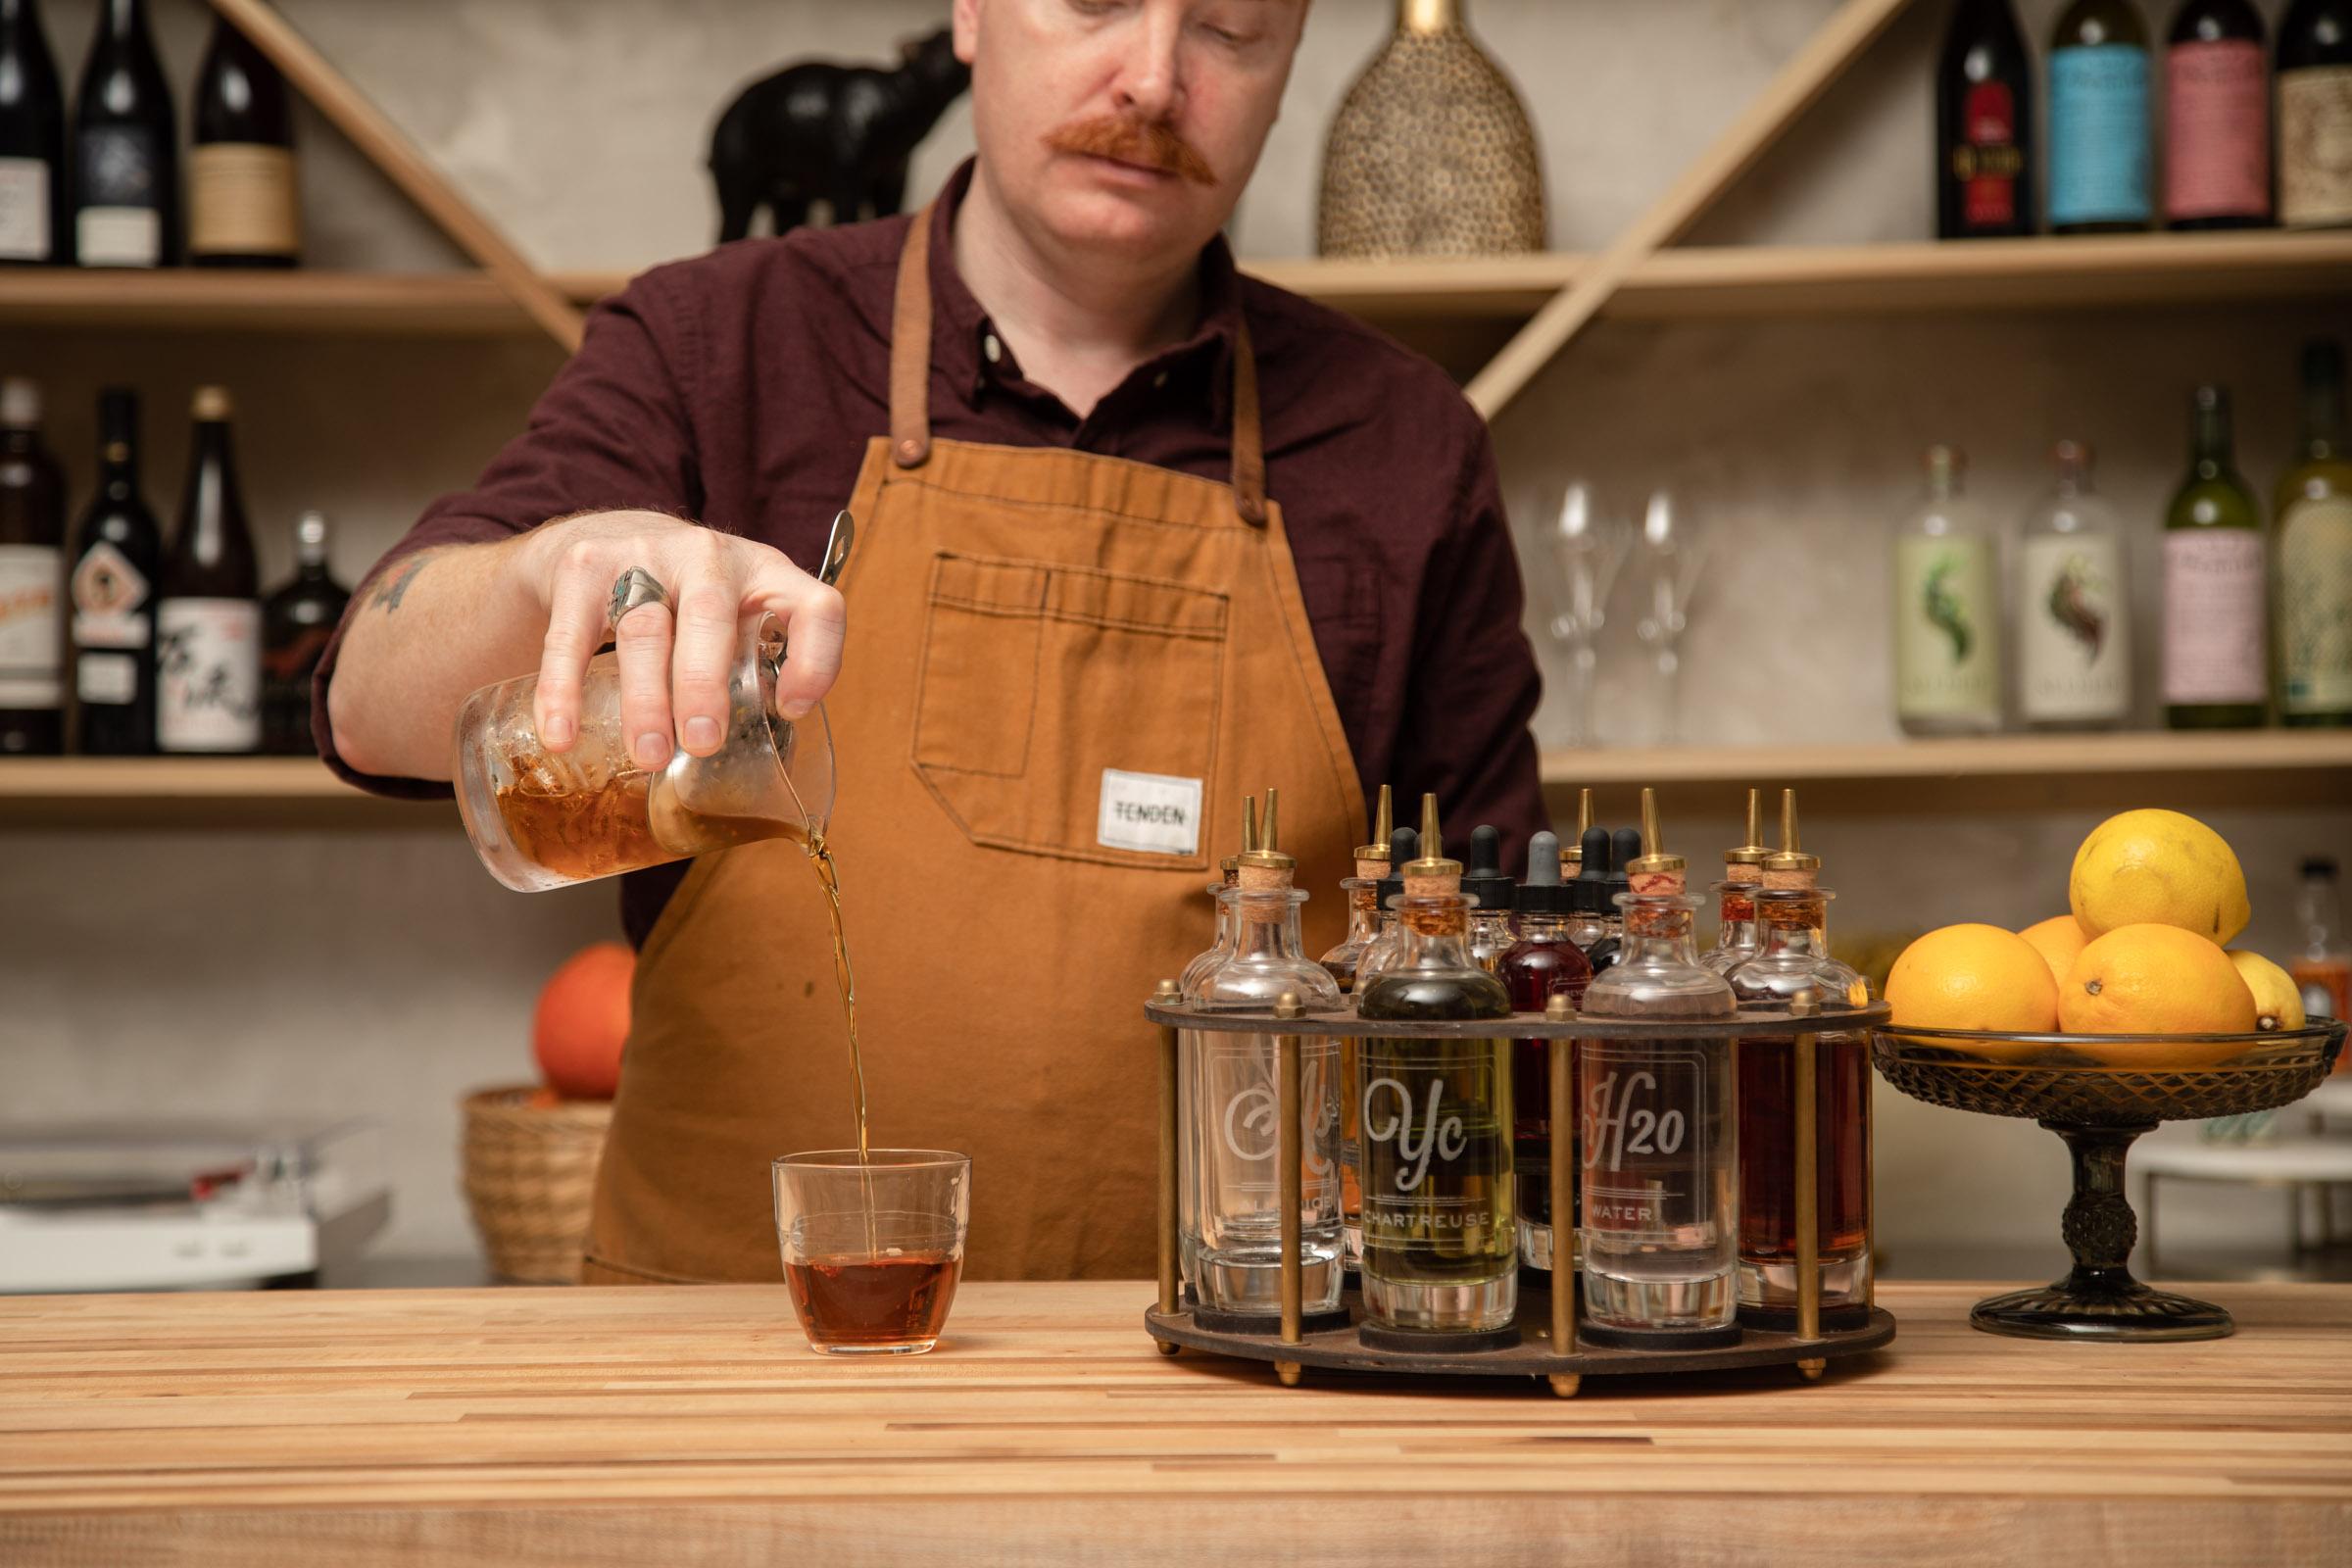 2018-11-29 Derby Cocktail, David Dines-1734.jpg